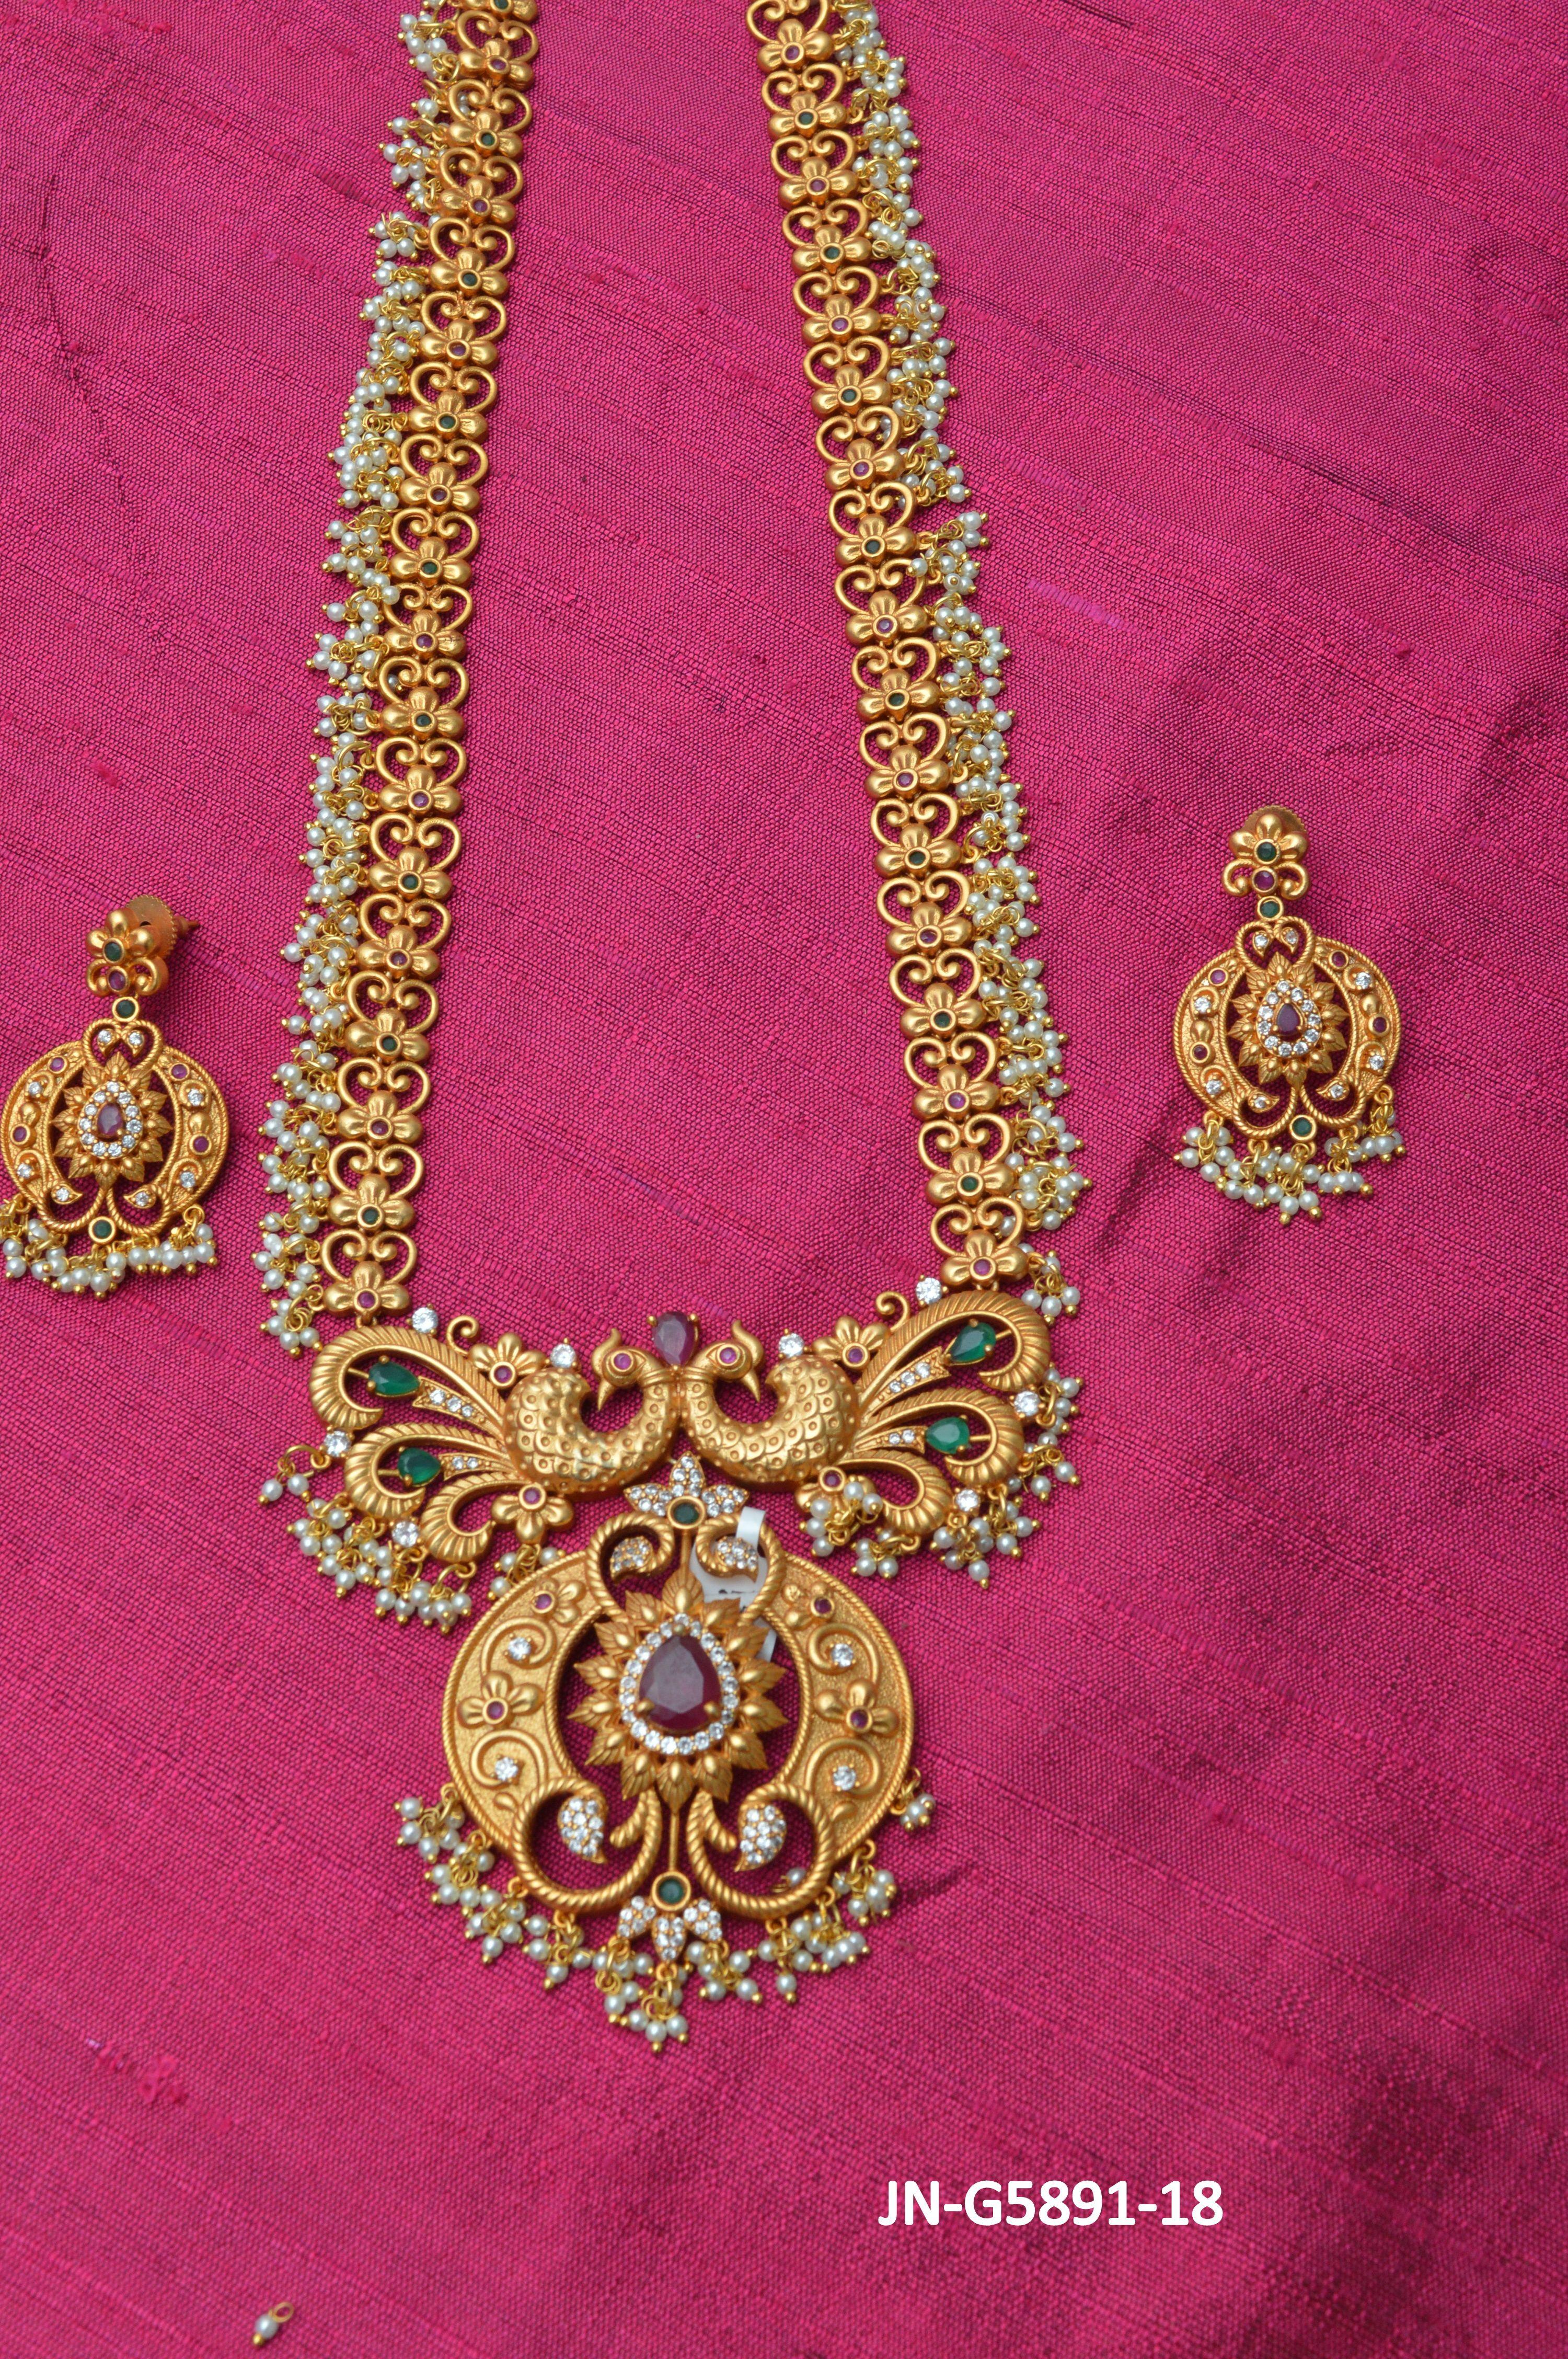 1 Gram Gold Matte Finish Jewellery